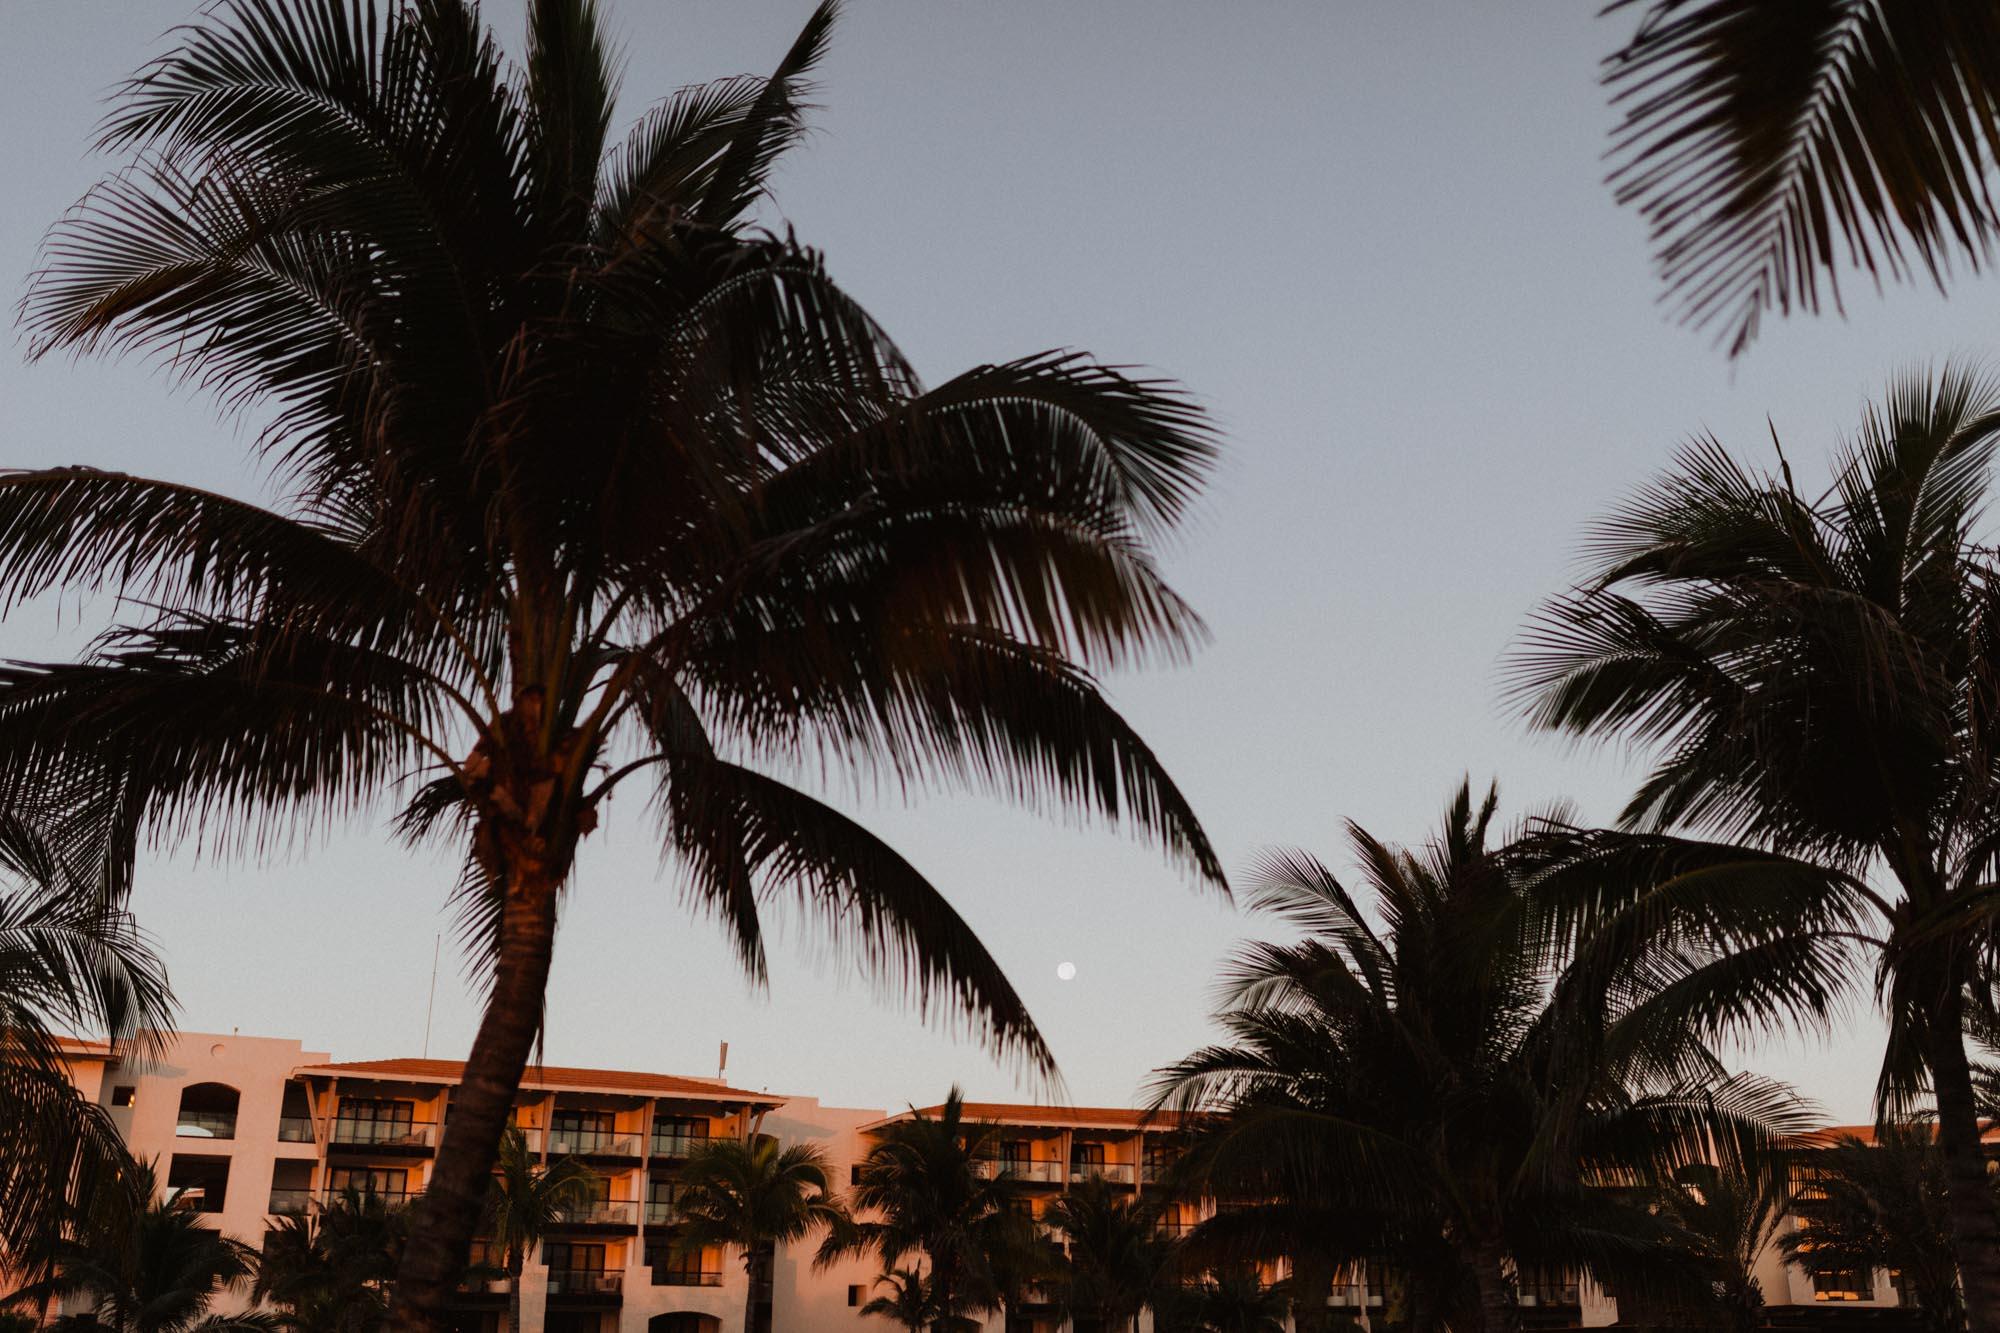 resort in early morning lighting